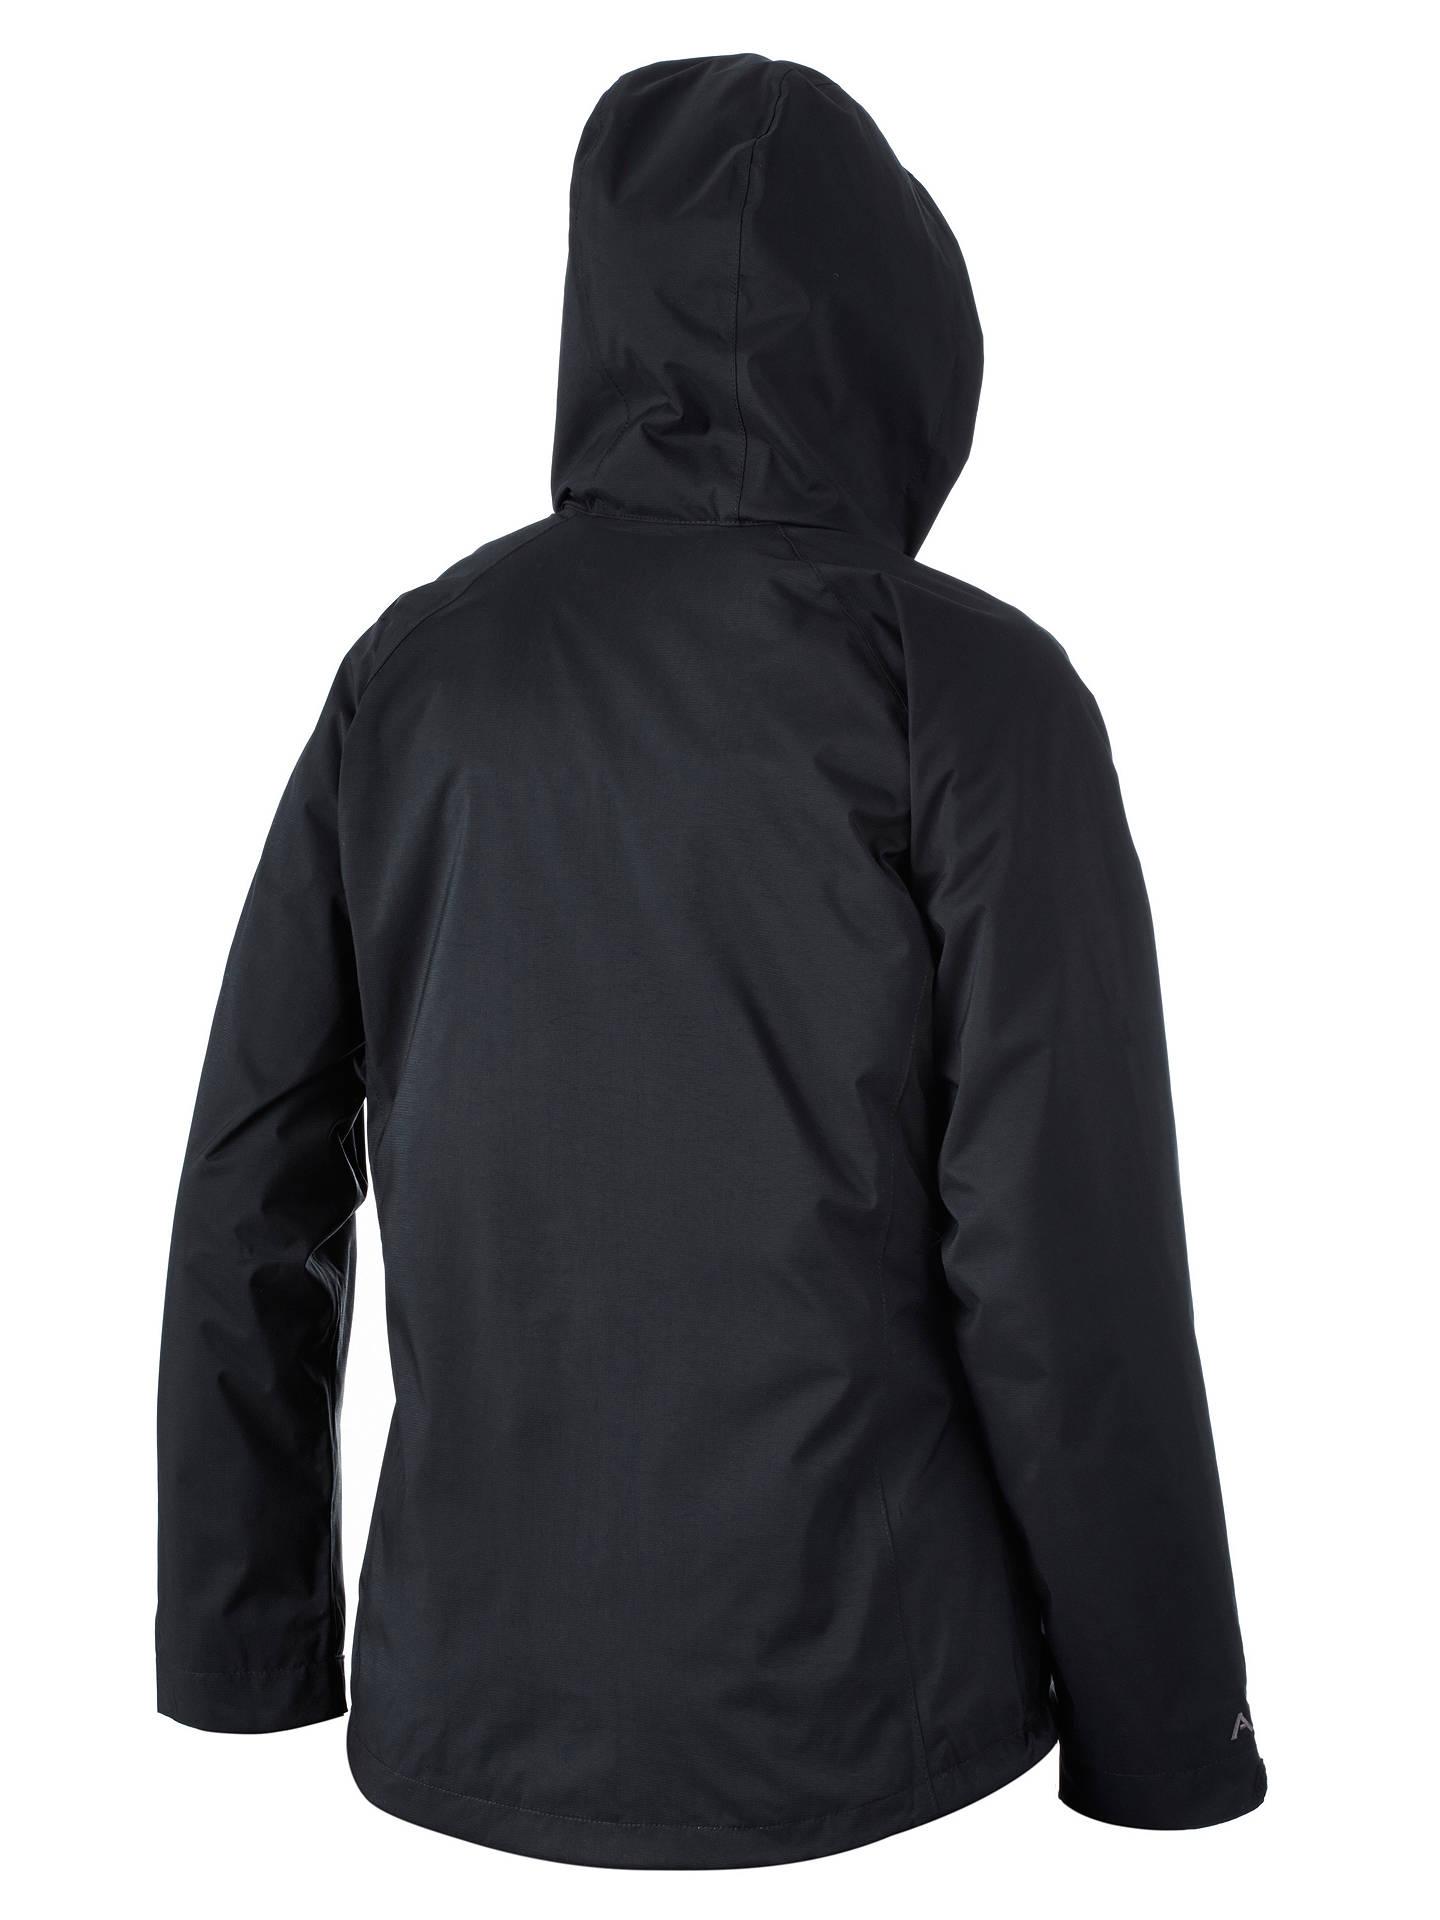 New Berghaus Womens Calisto Alpha Jacket Outdoor Clothing